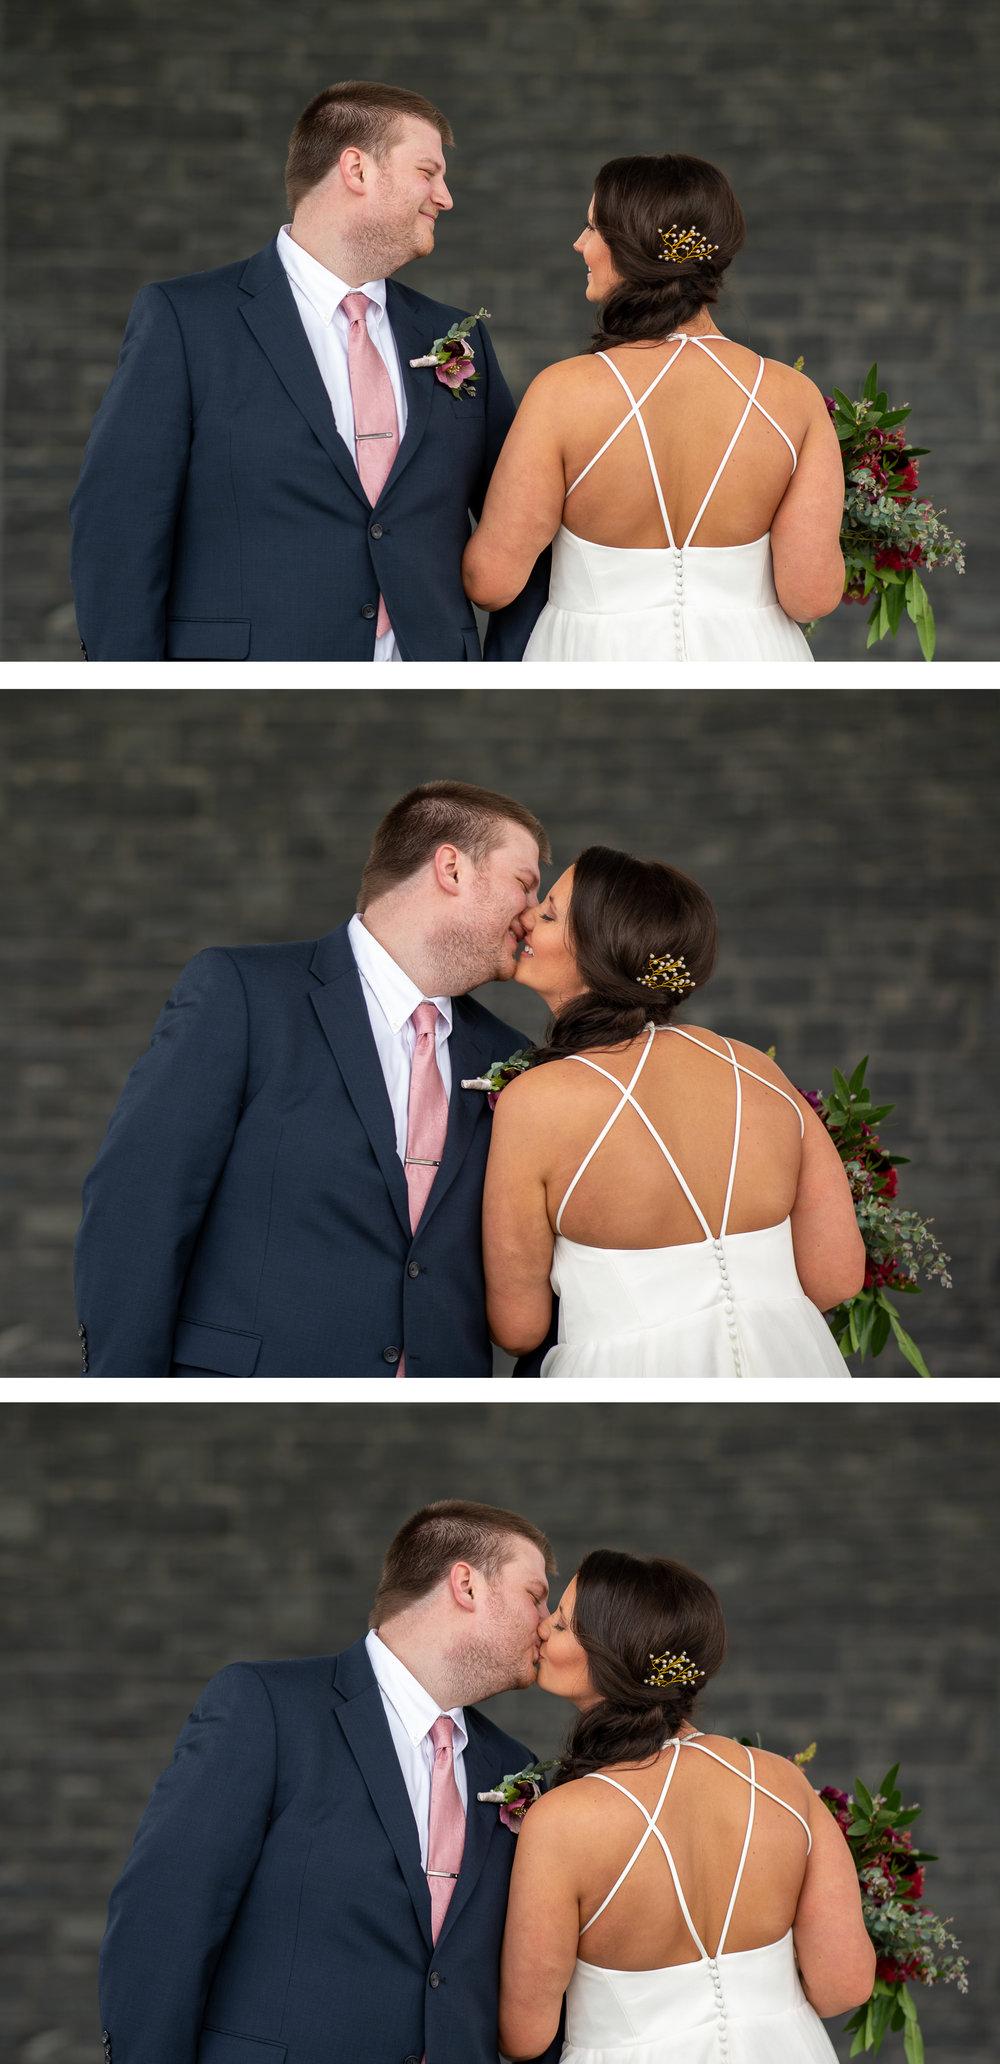 Brett Loves Elle Photography, Columbus Wedding Photographers, Ohio Wedding Photography, Wedding Day Bride and Groom Portrait